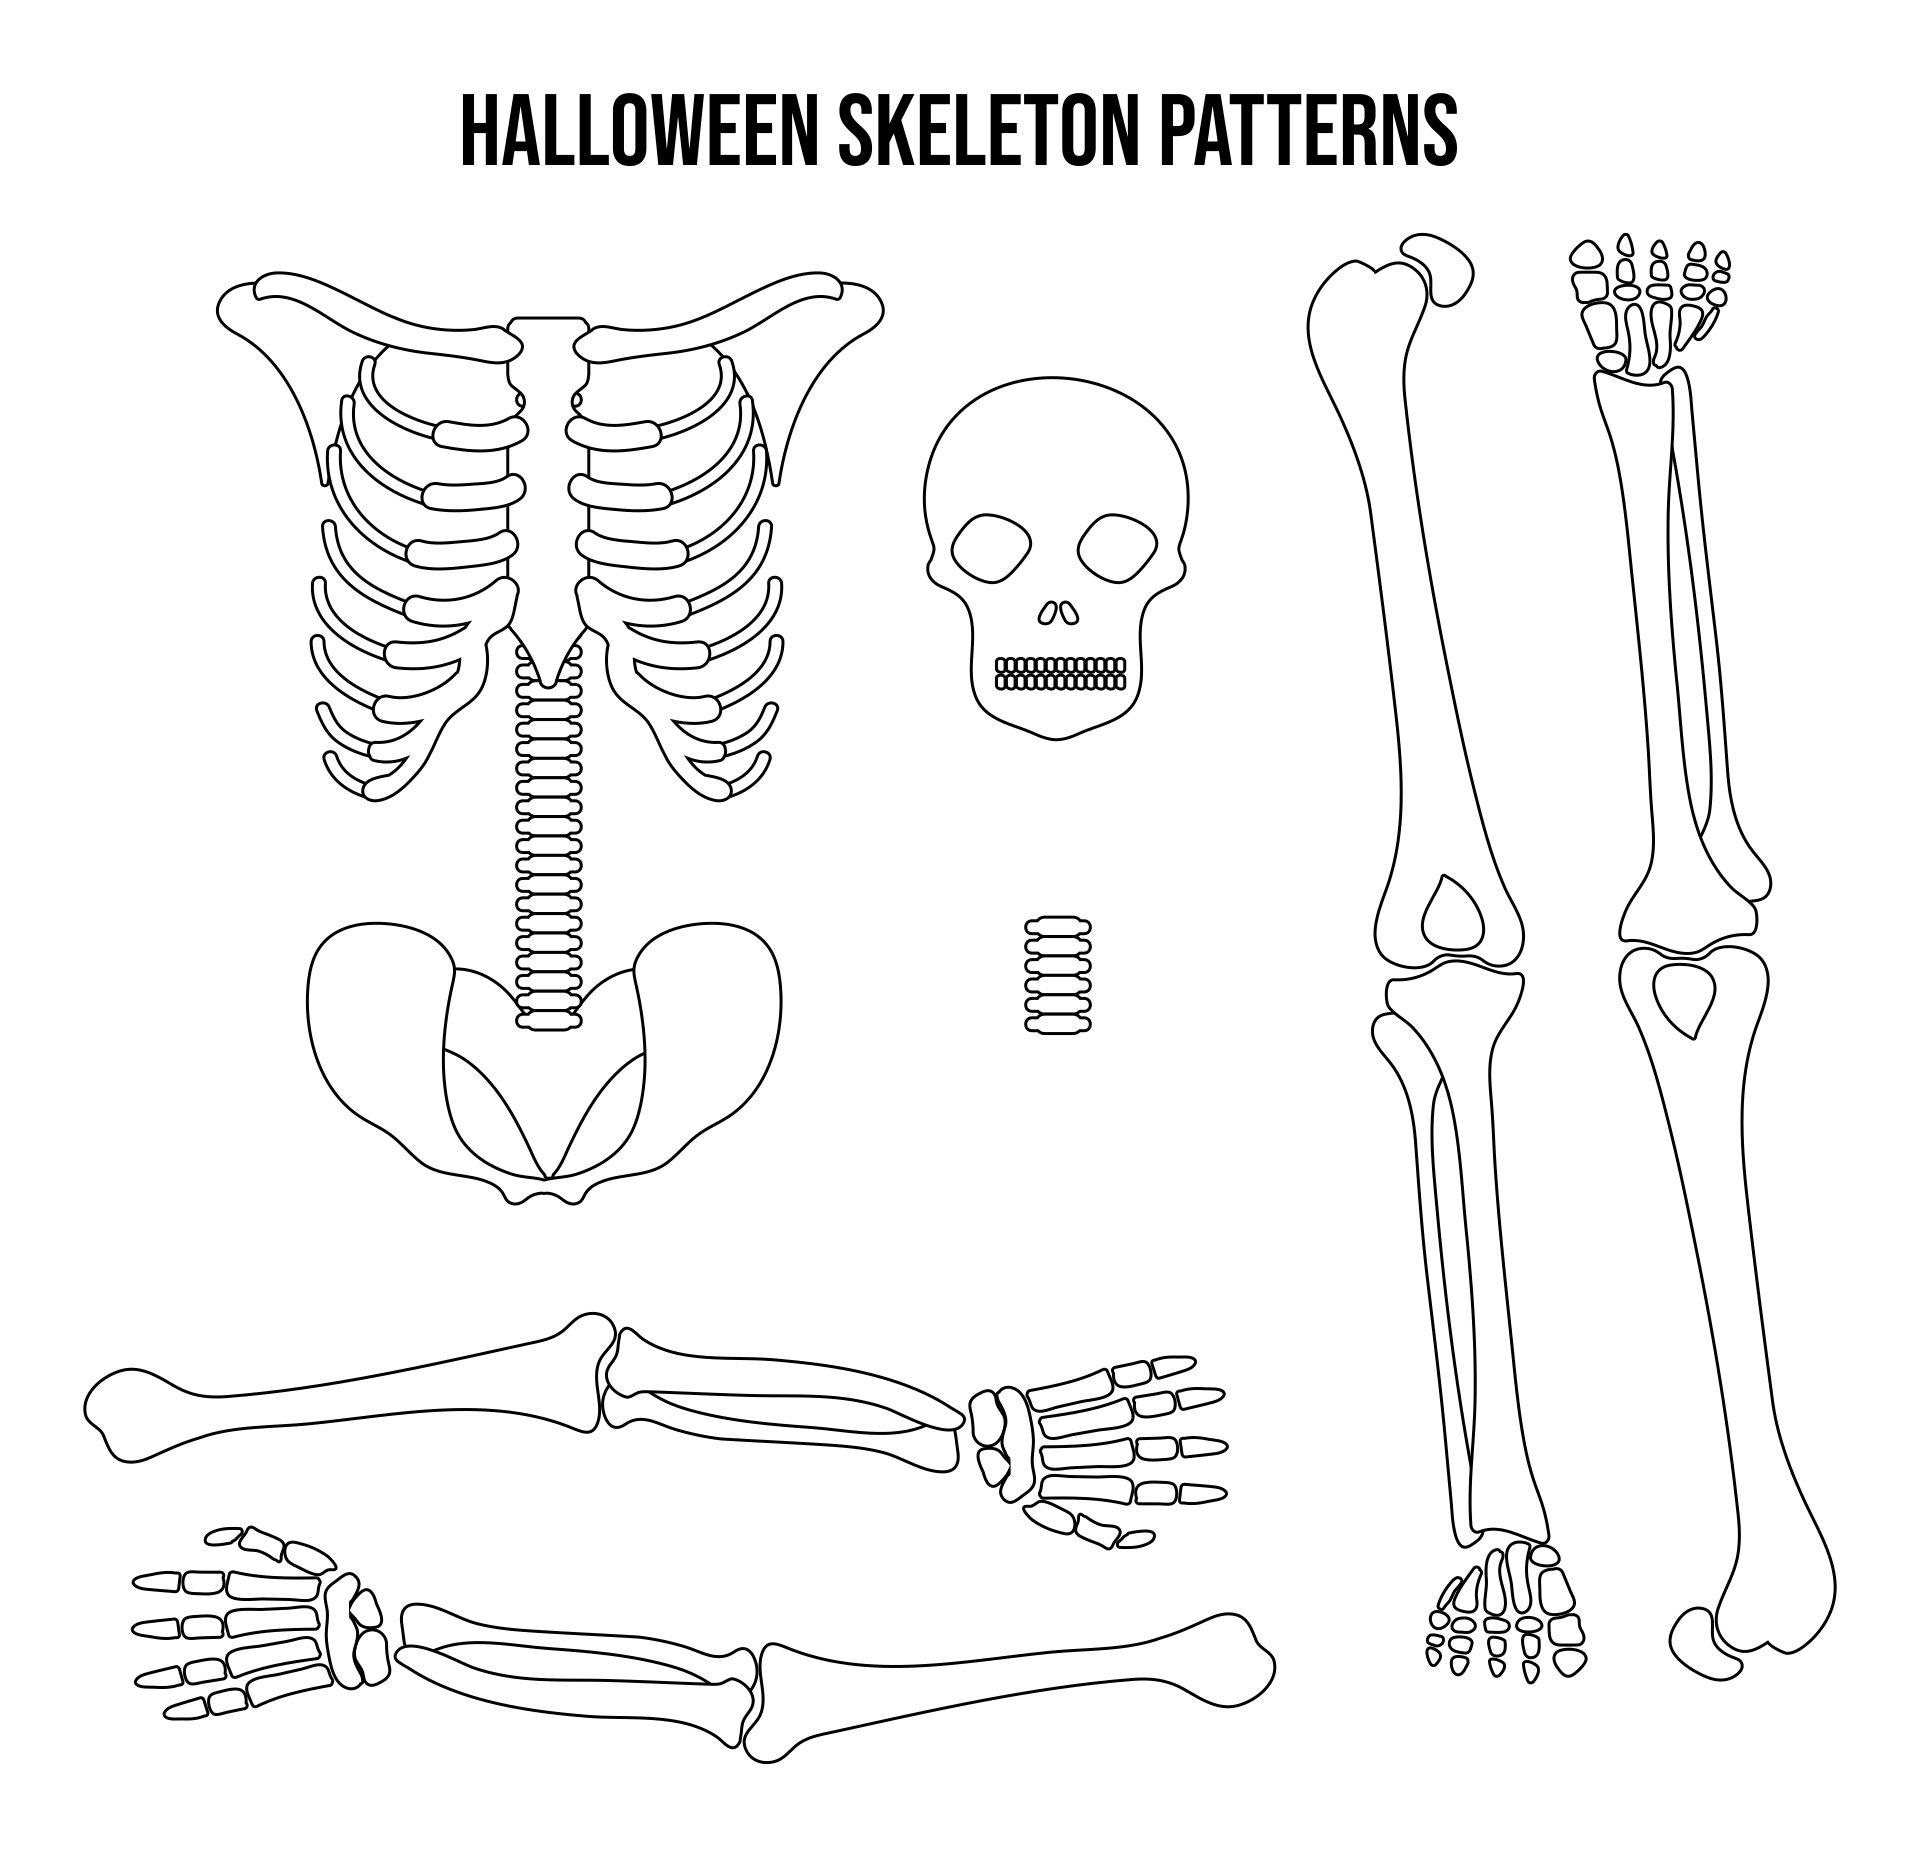 Printable Halloween Skeleton Patterns